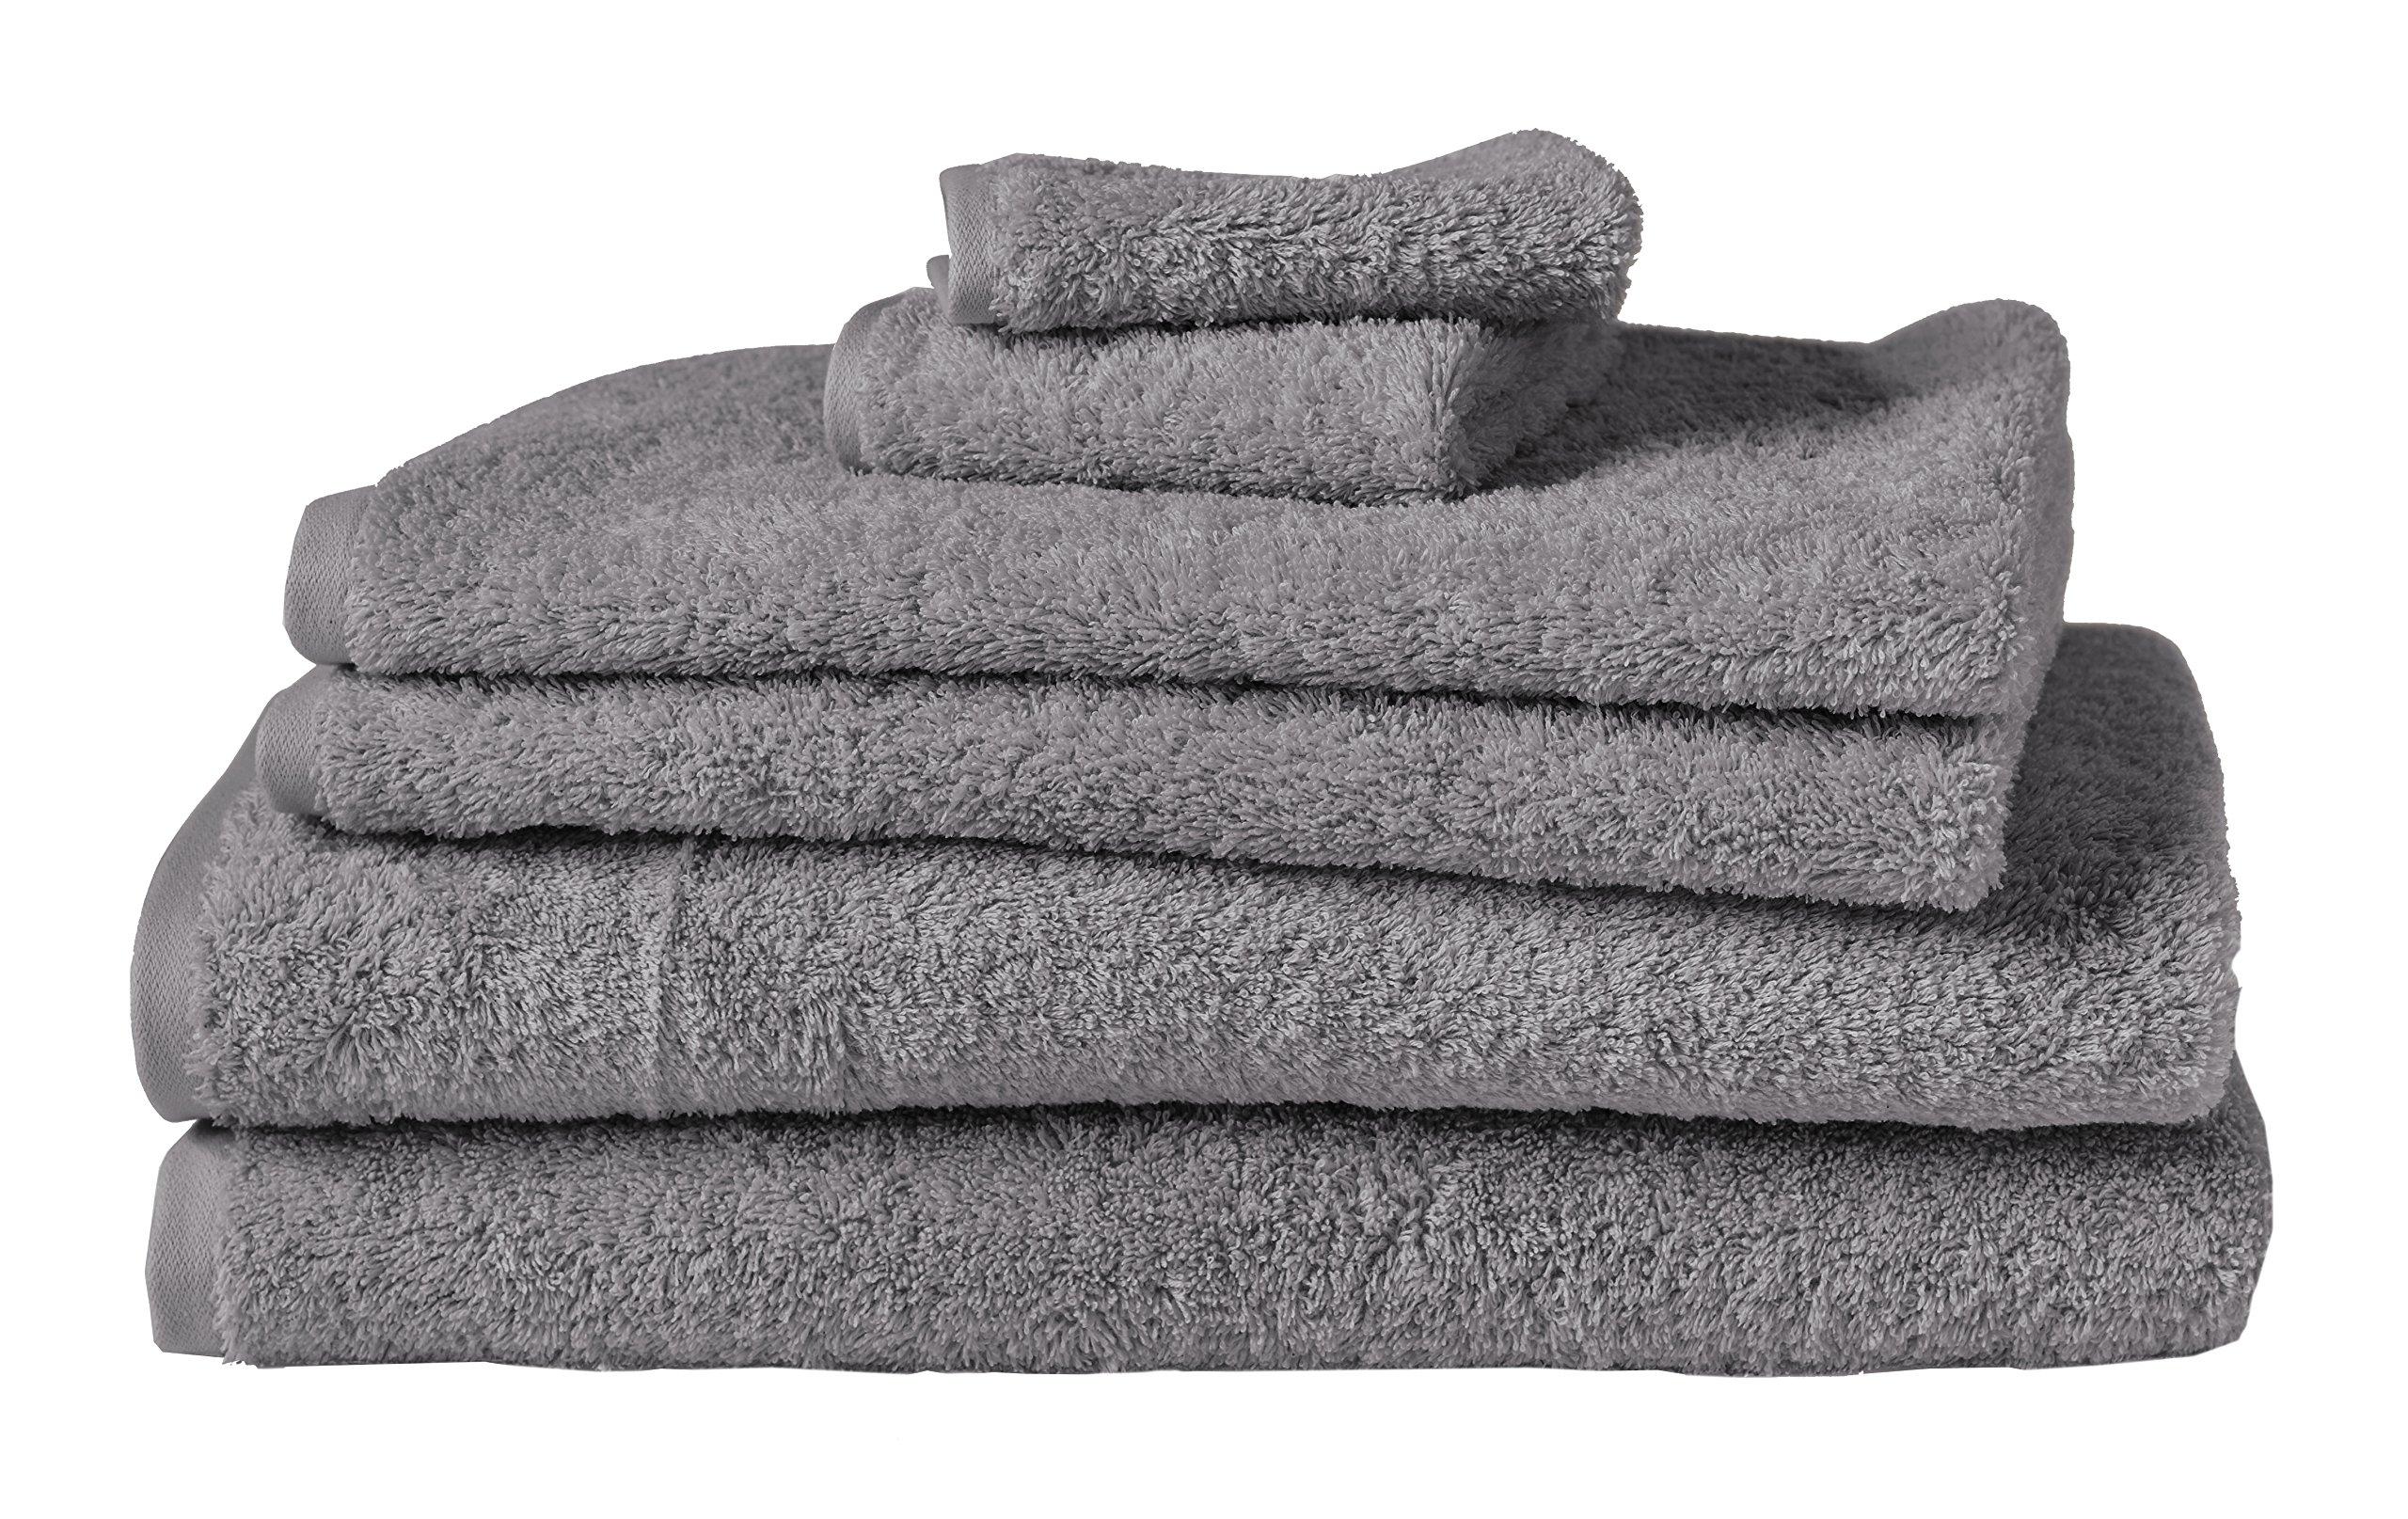 Coyuchi 1019335 6 Piece Organic Cloud Loom Towel Set, Slate